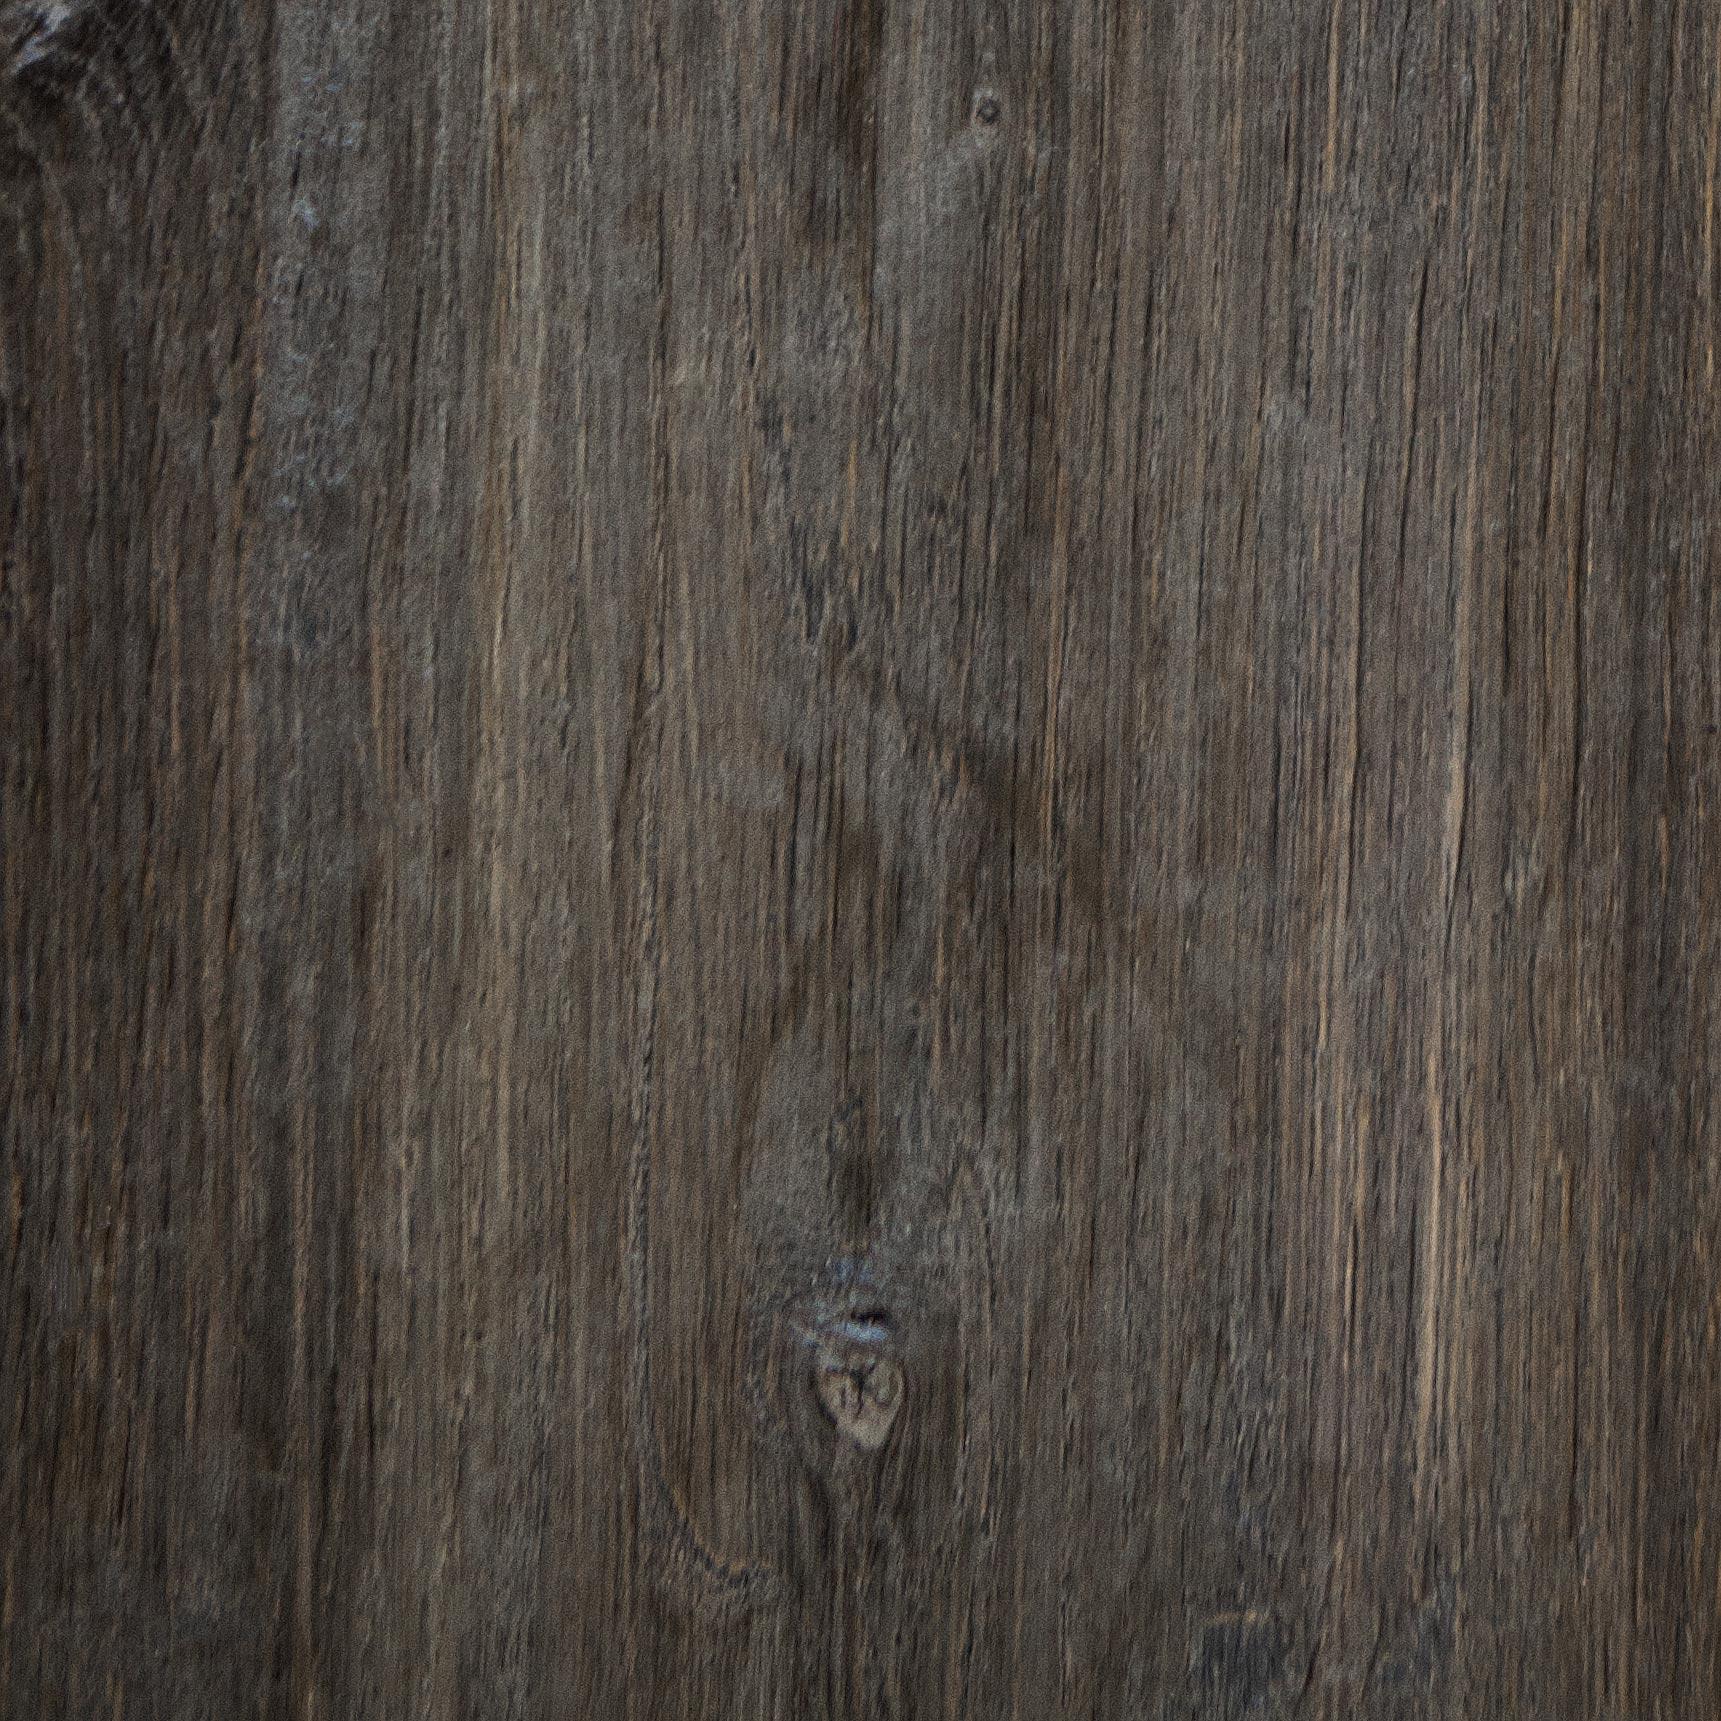 Element7-wide-plank-samples-Purdey-oak-IMG_1876